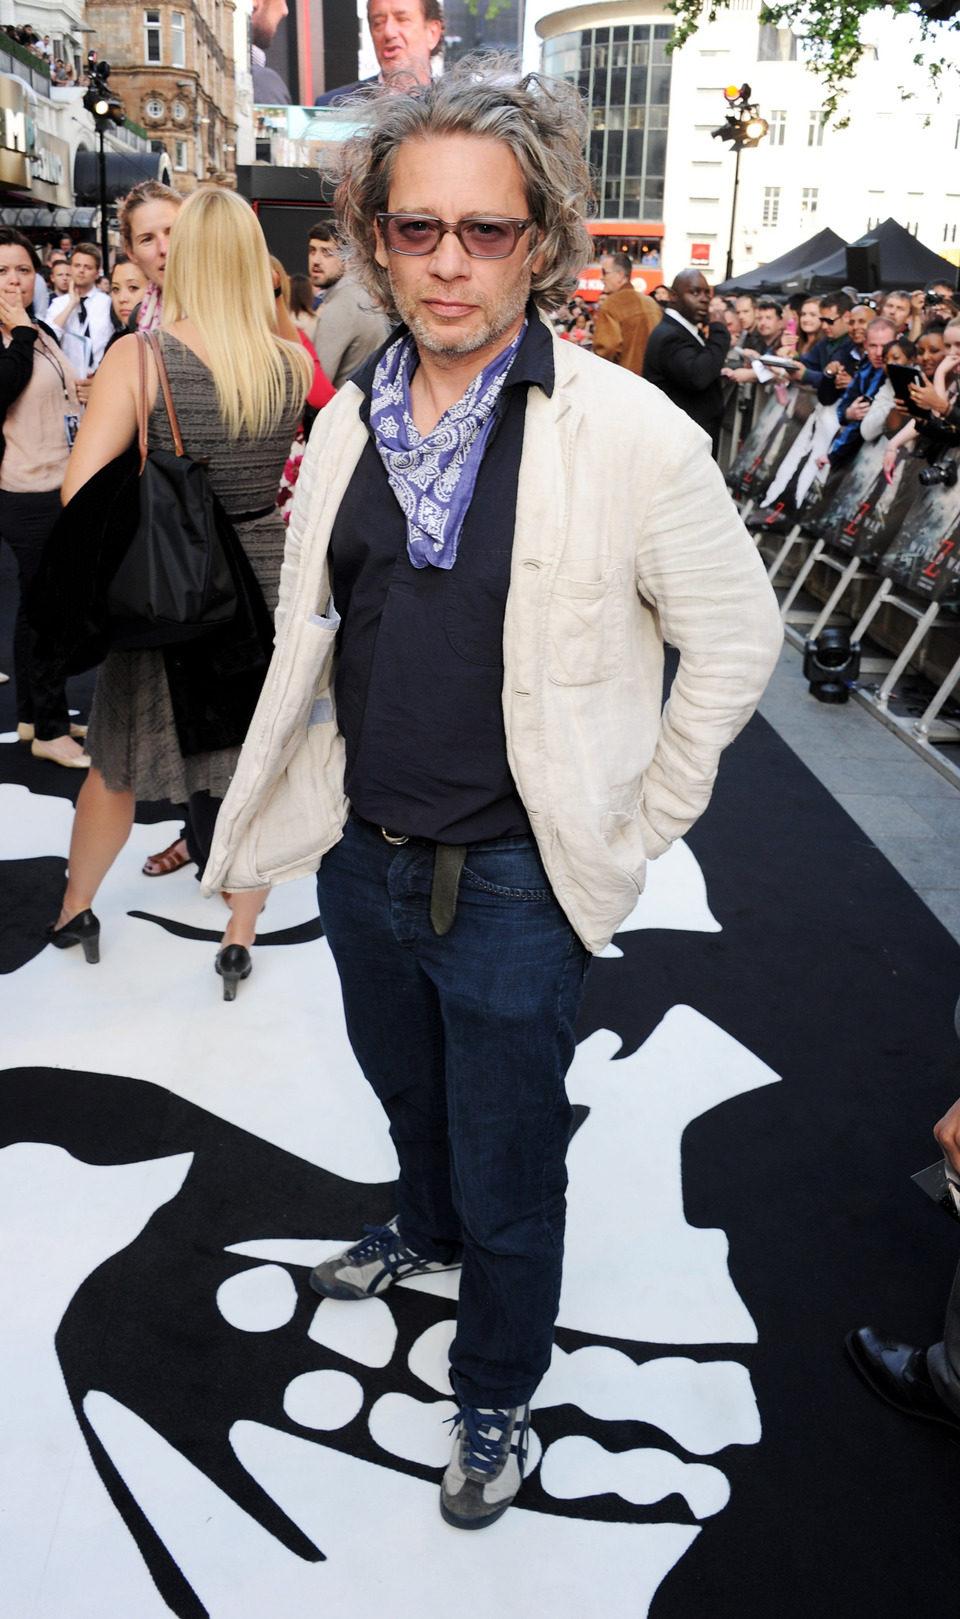 Dexter Fietcher en el estreno de 'Guerra Mundial Z' en Londres